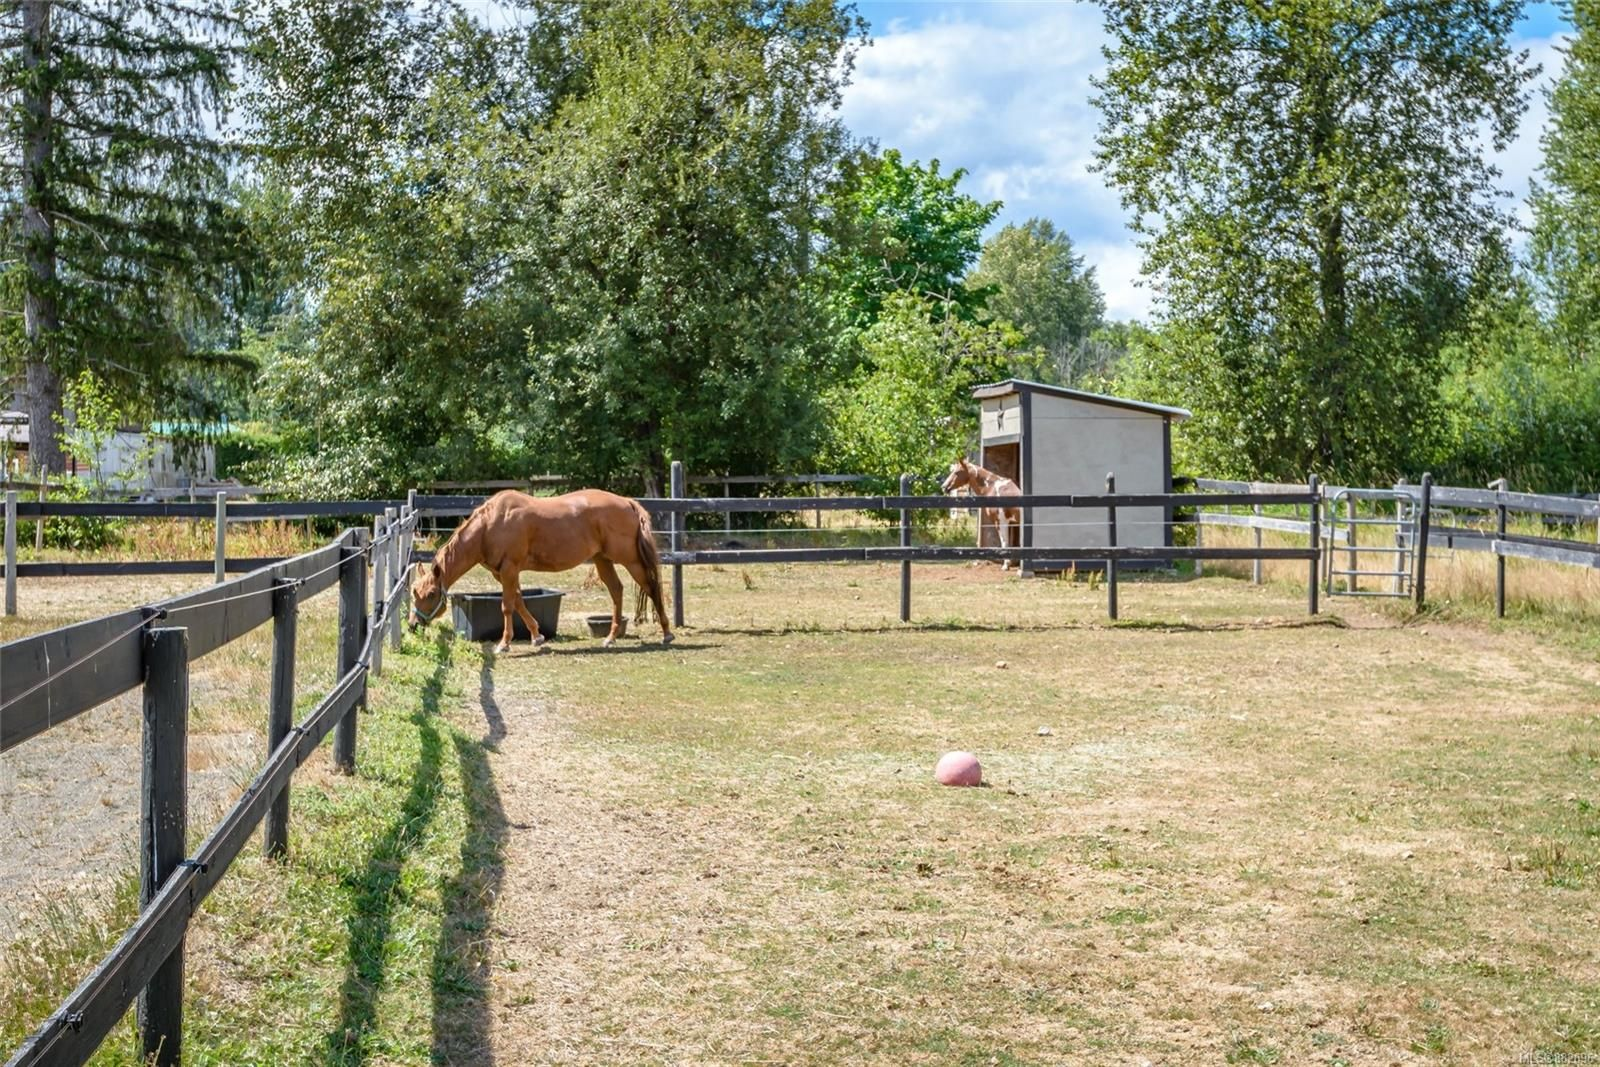 Photo 29: Photos: 3554 MacAulay Rd in : CV Merville Black Creek House for sale (Comox Valley)  : MLS®# 882696